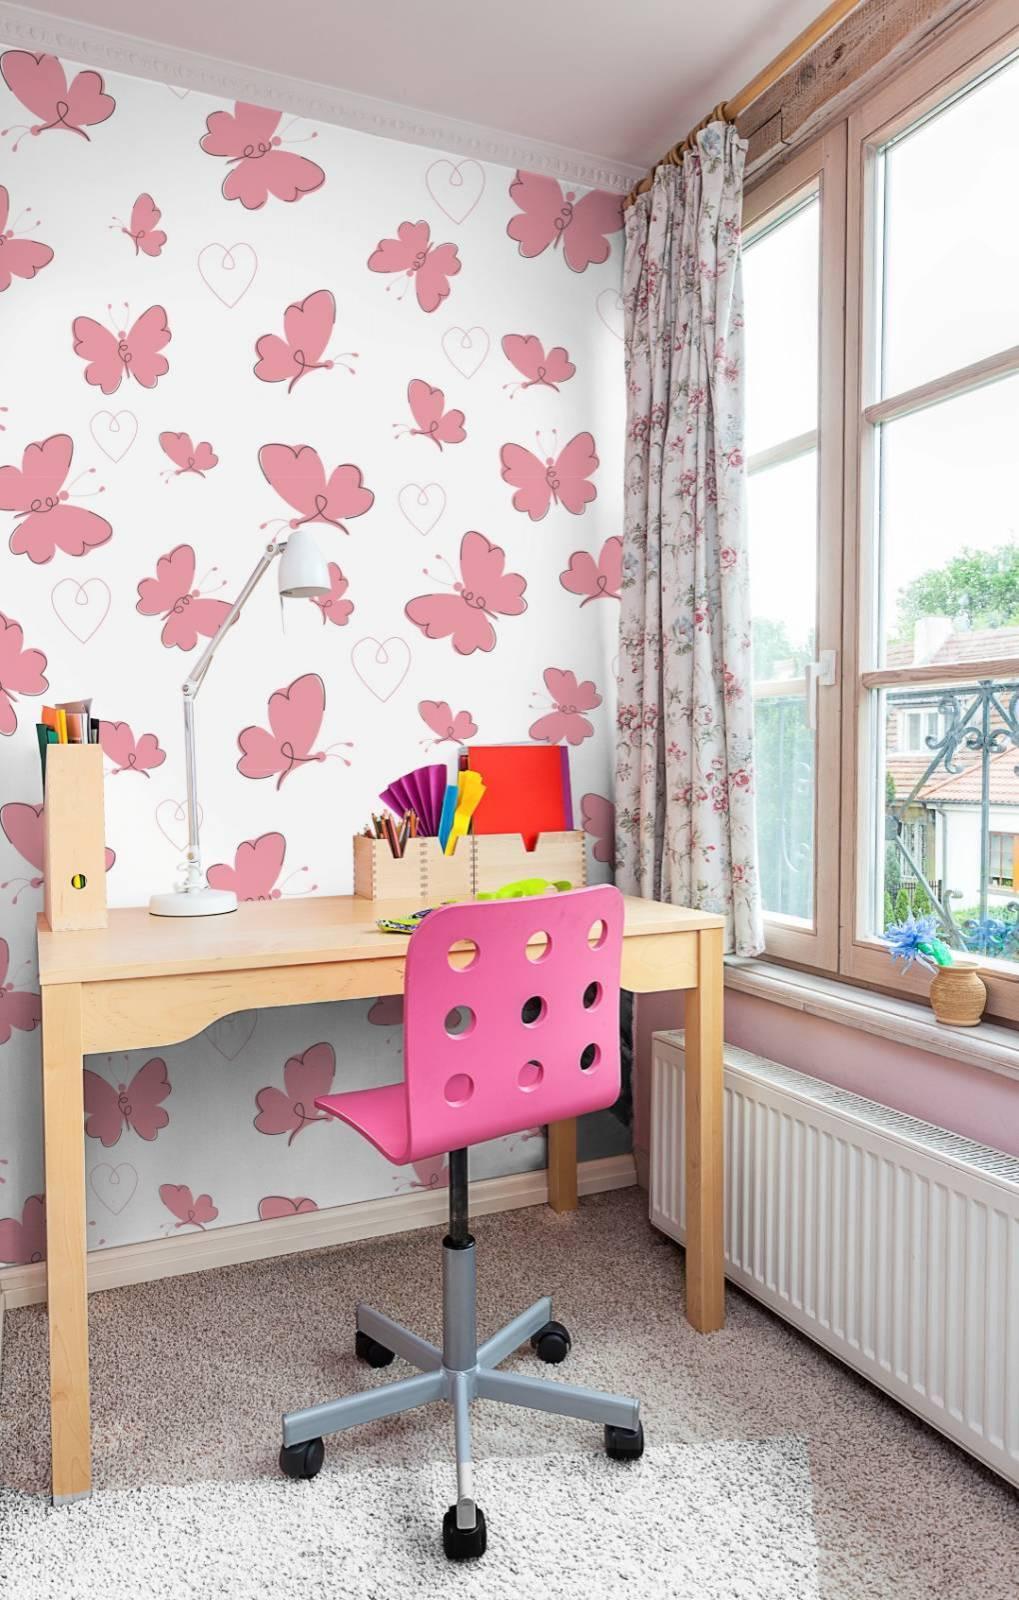 Papel de Parede Adesivo  Pink Butterflies /Rolo  imagem 4